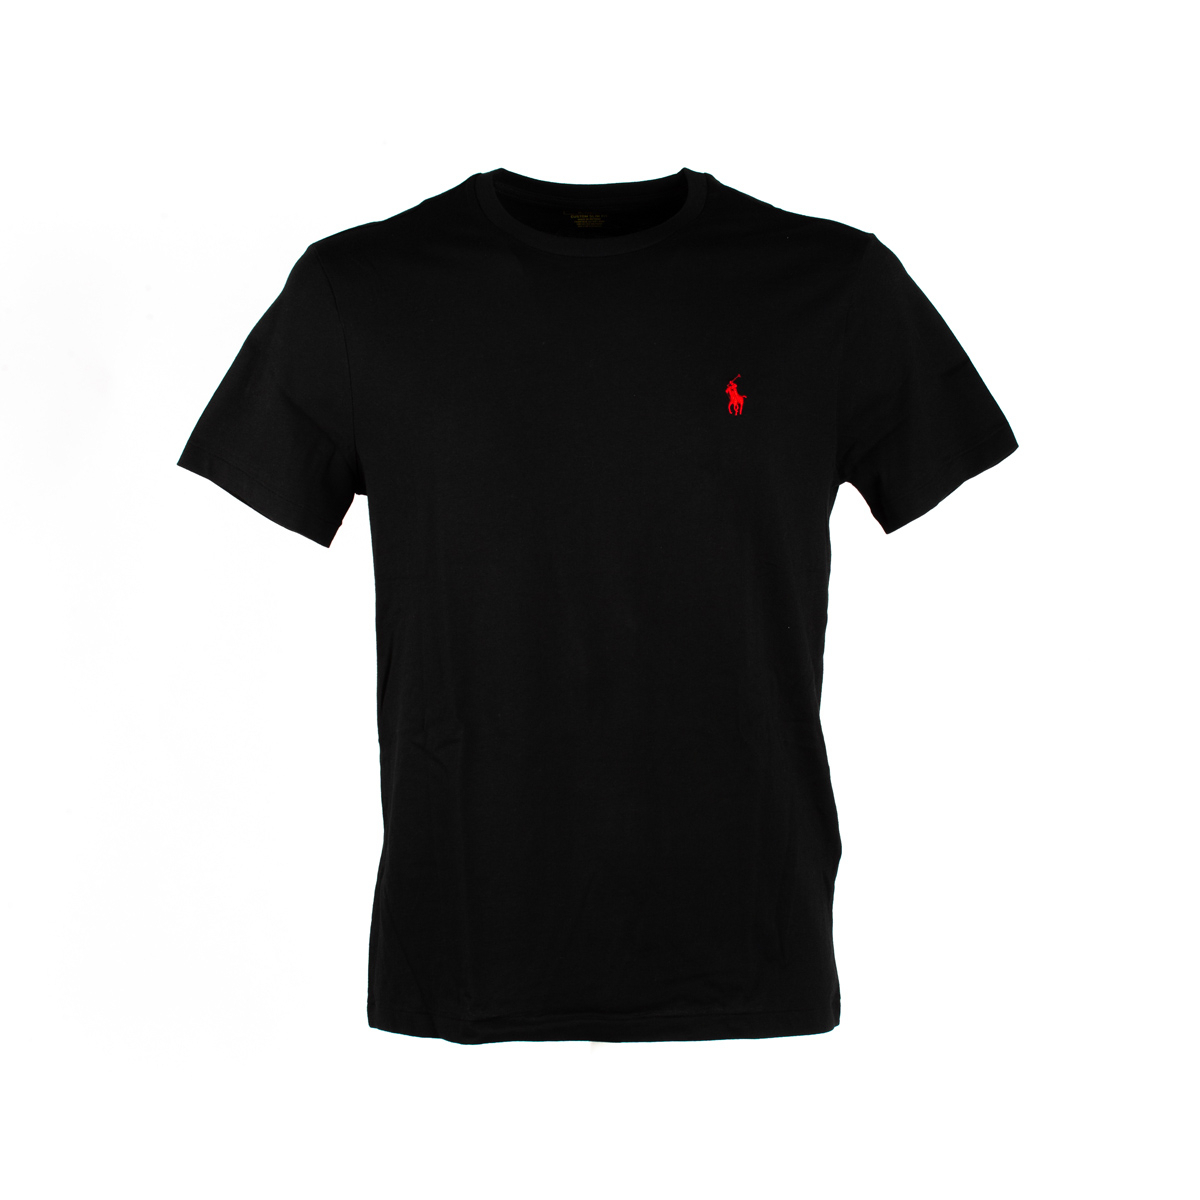 T-Shirt Manica Corta Polo Ralph Lauren Nera